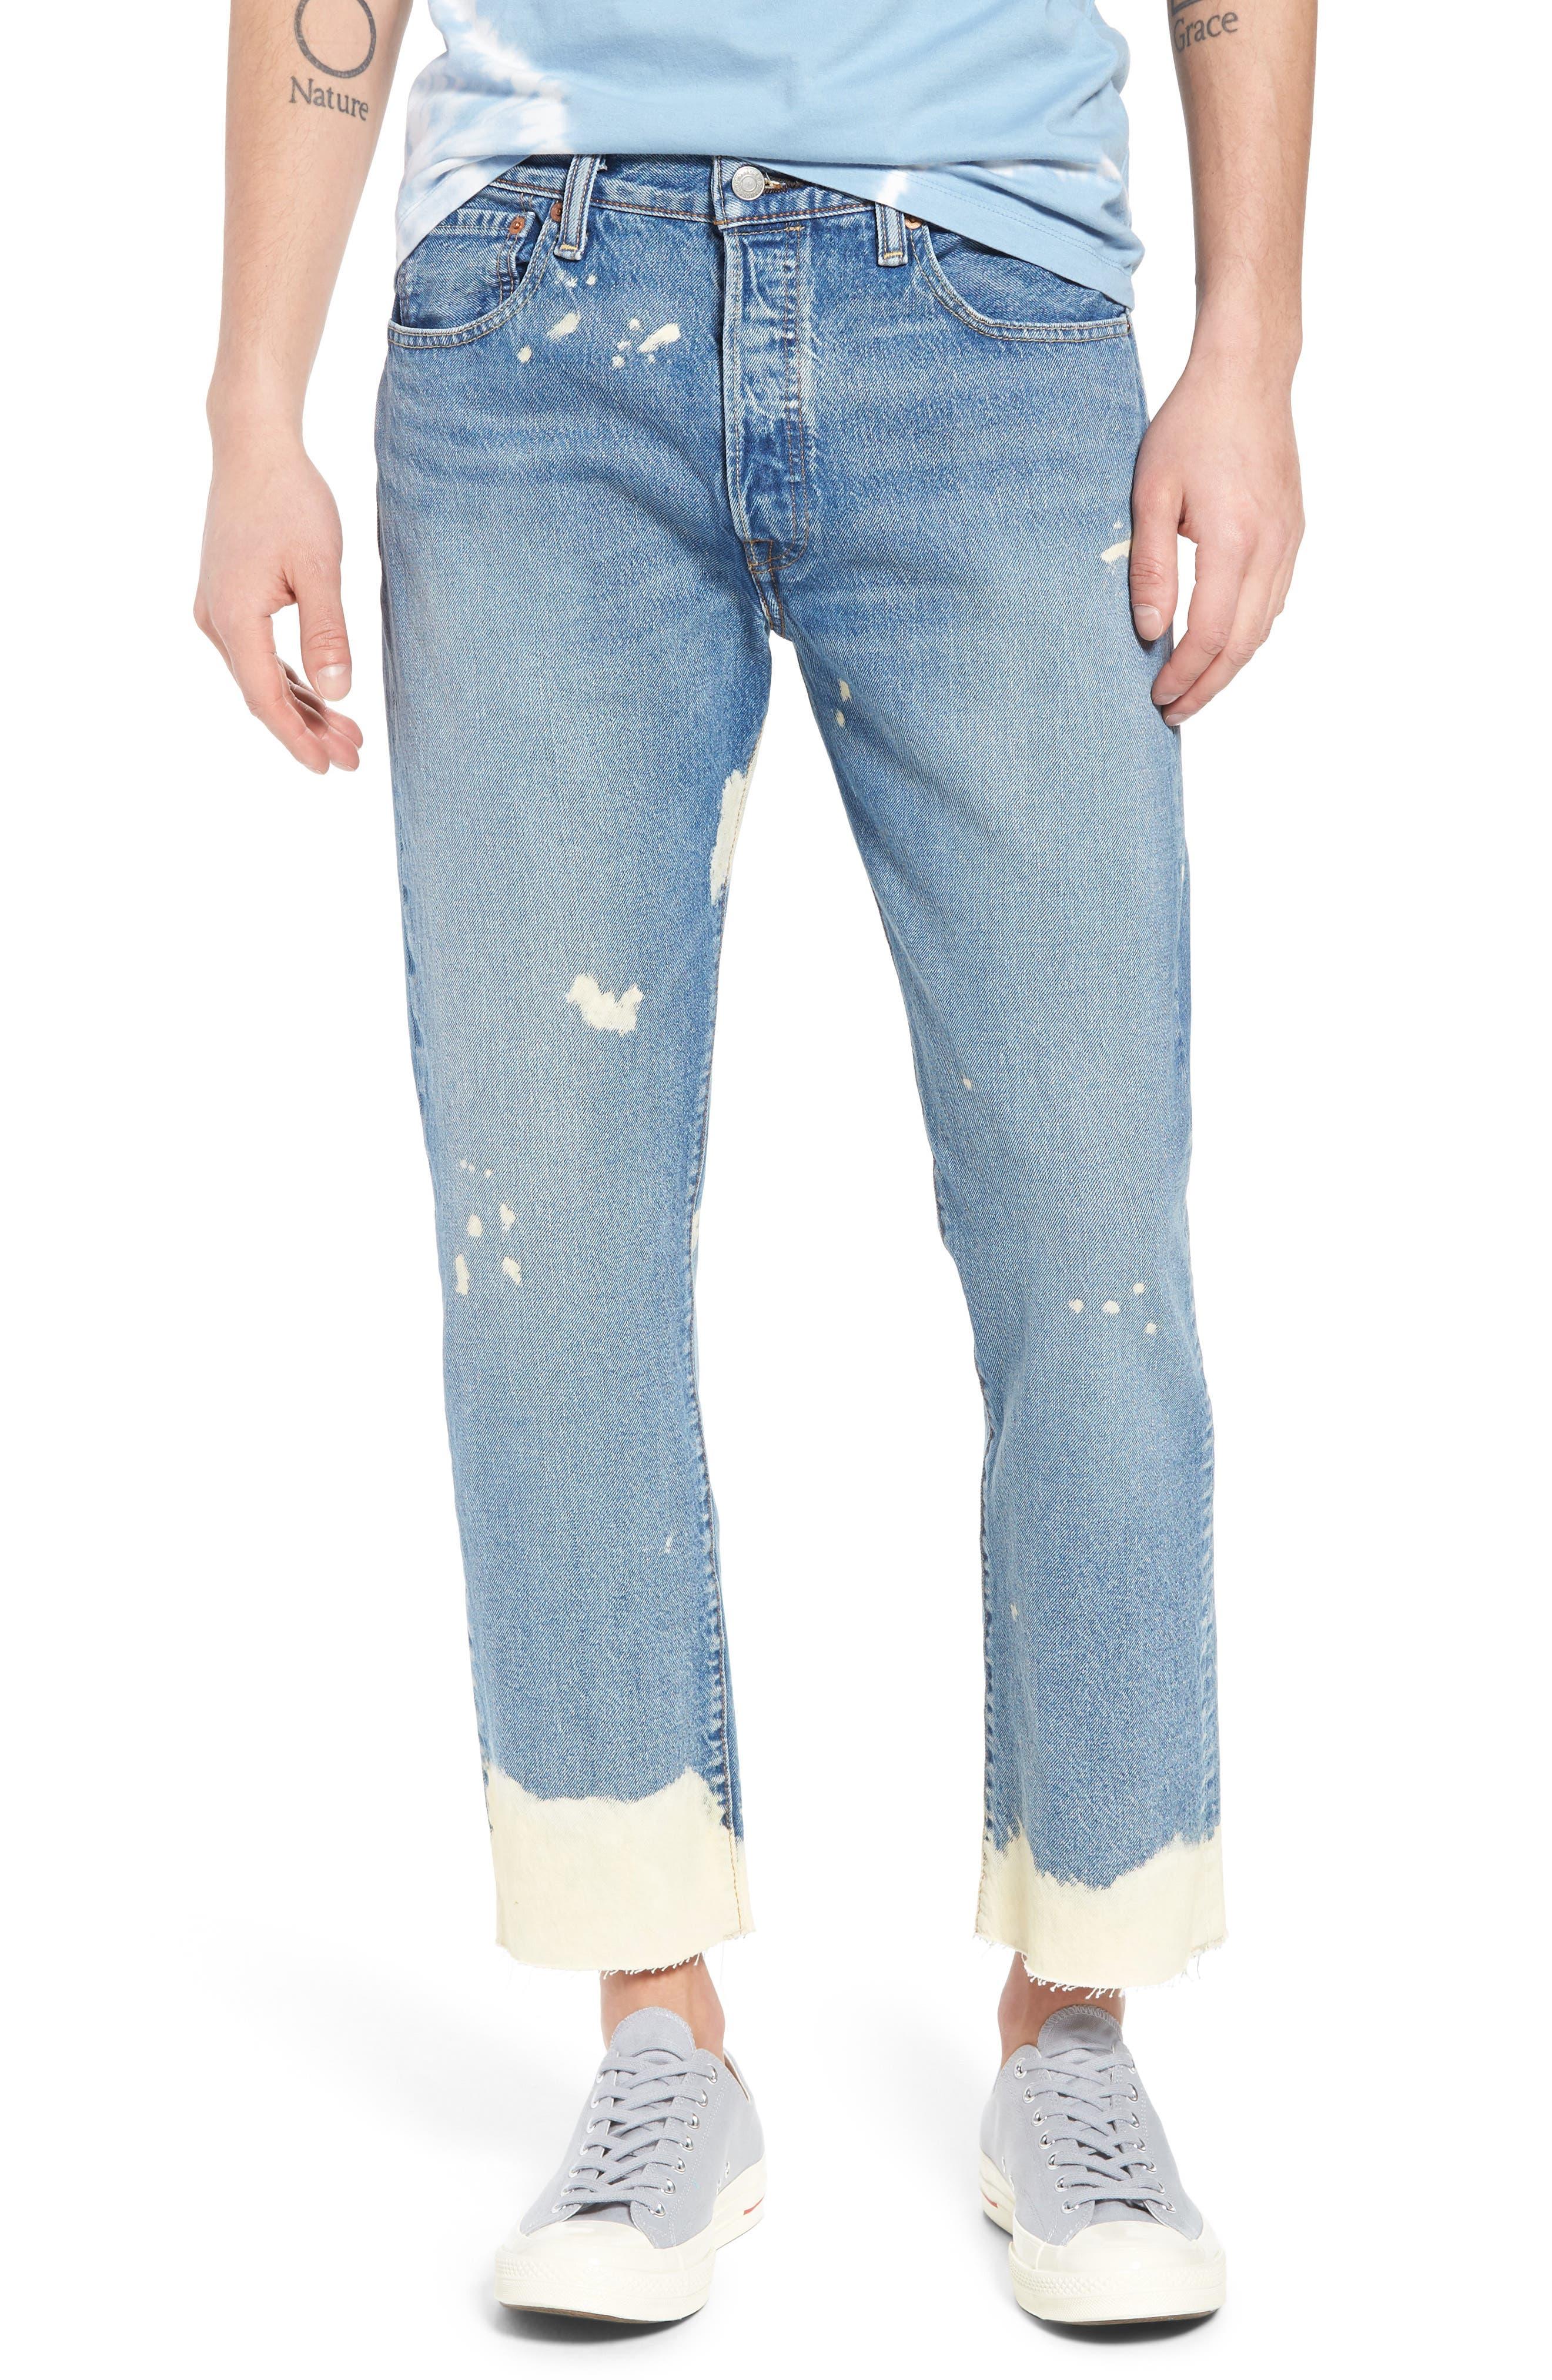 LEVI'S<SUP>®</SUP> 501<sup>®</sup> Original Straight Leg Cutoff Jeans, Main, color, 421